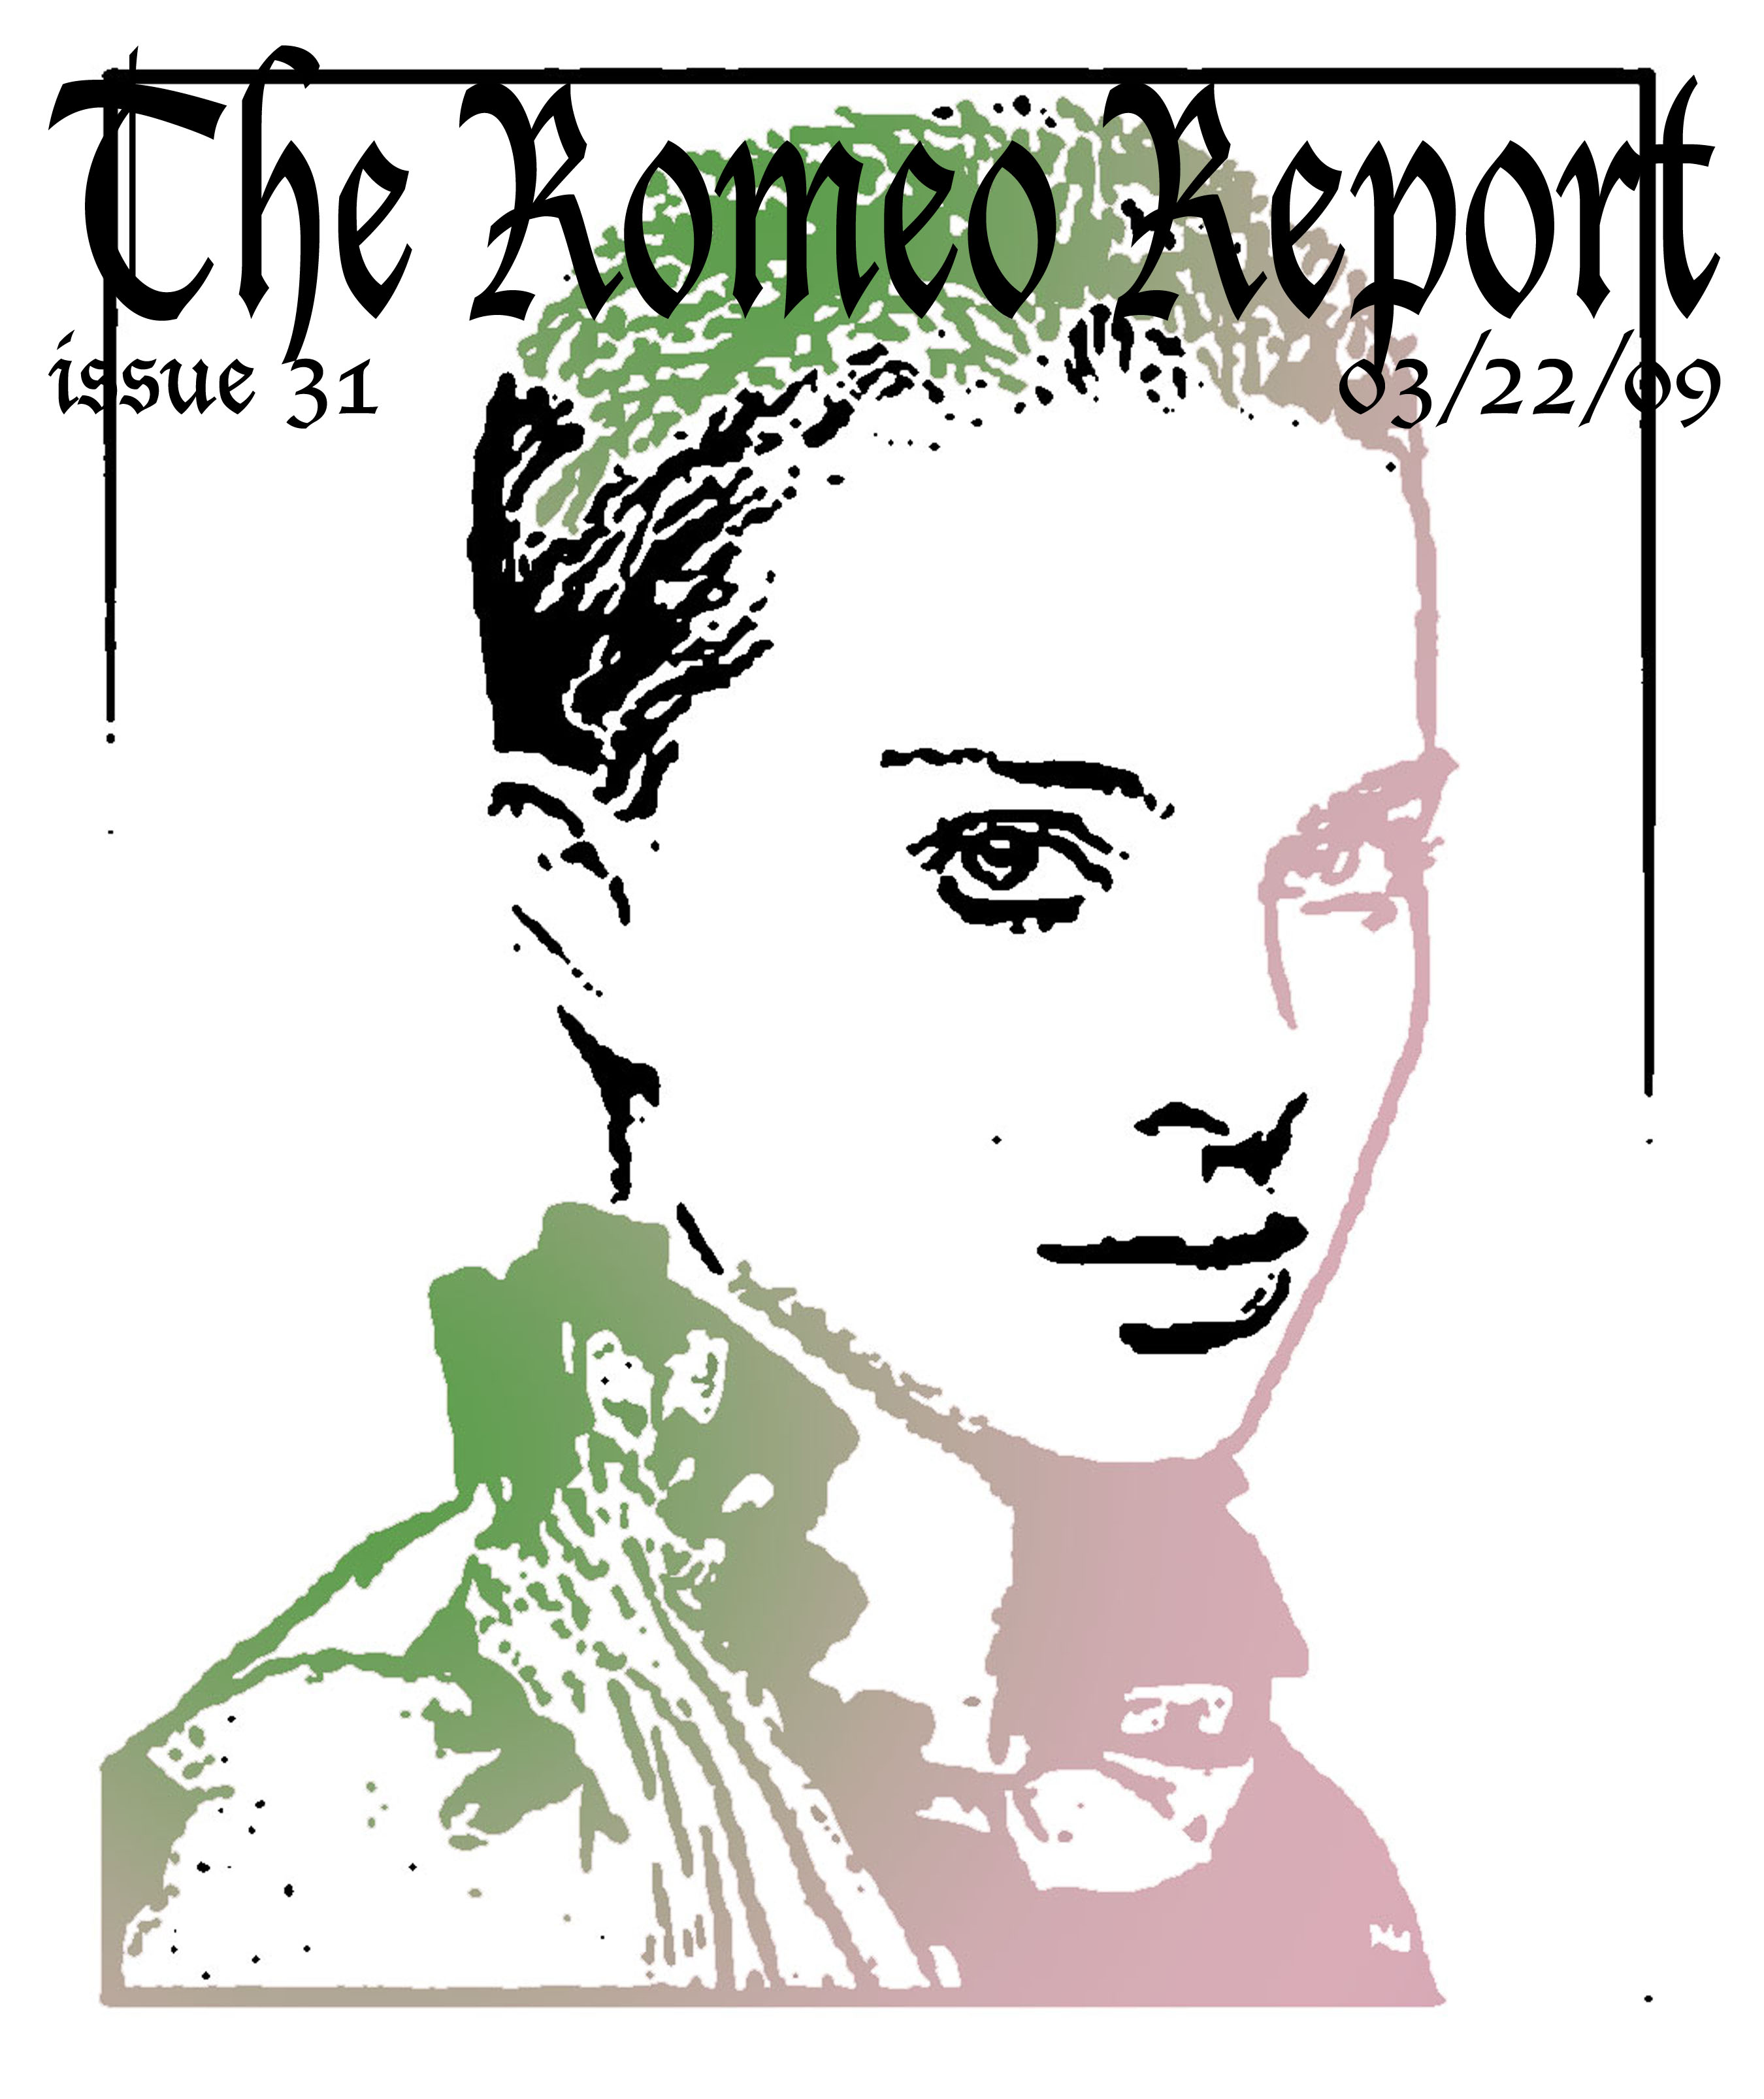 theromeoreport-issue-31